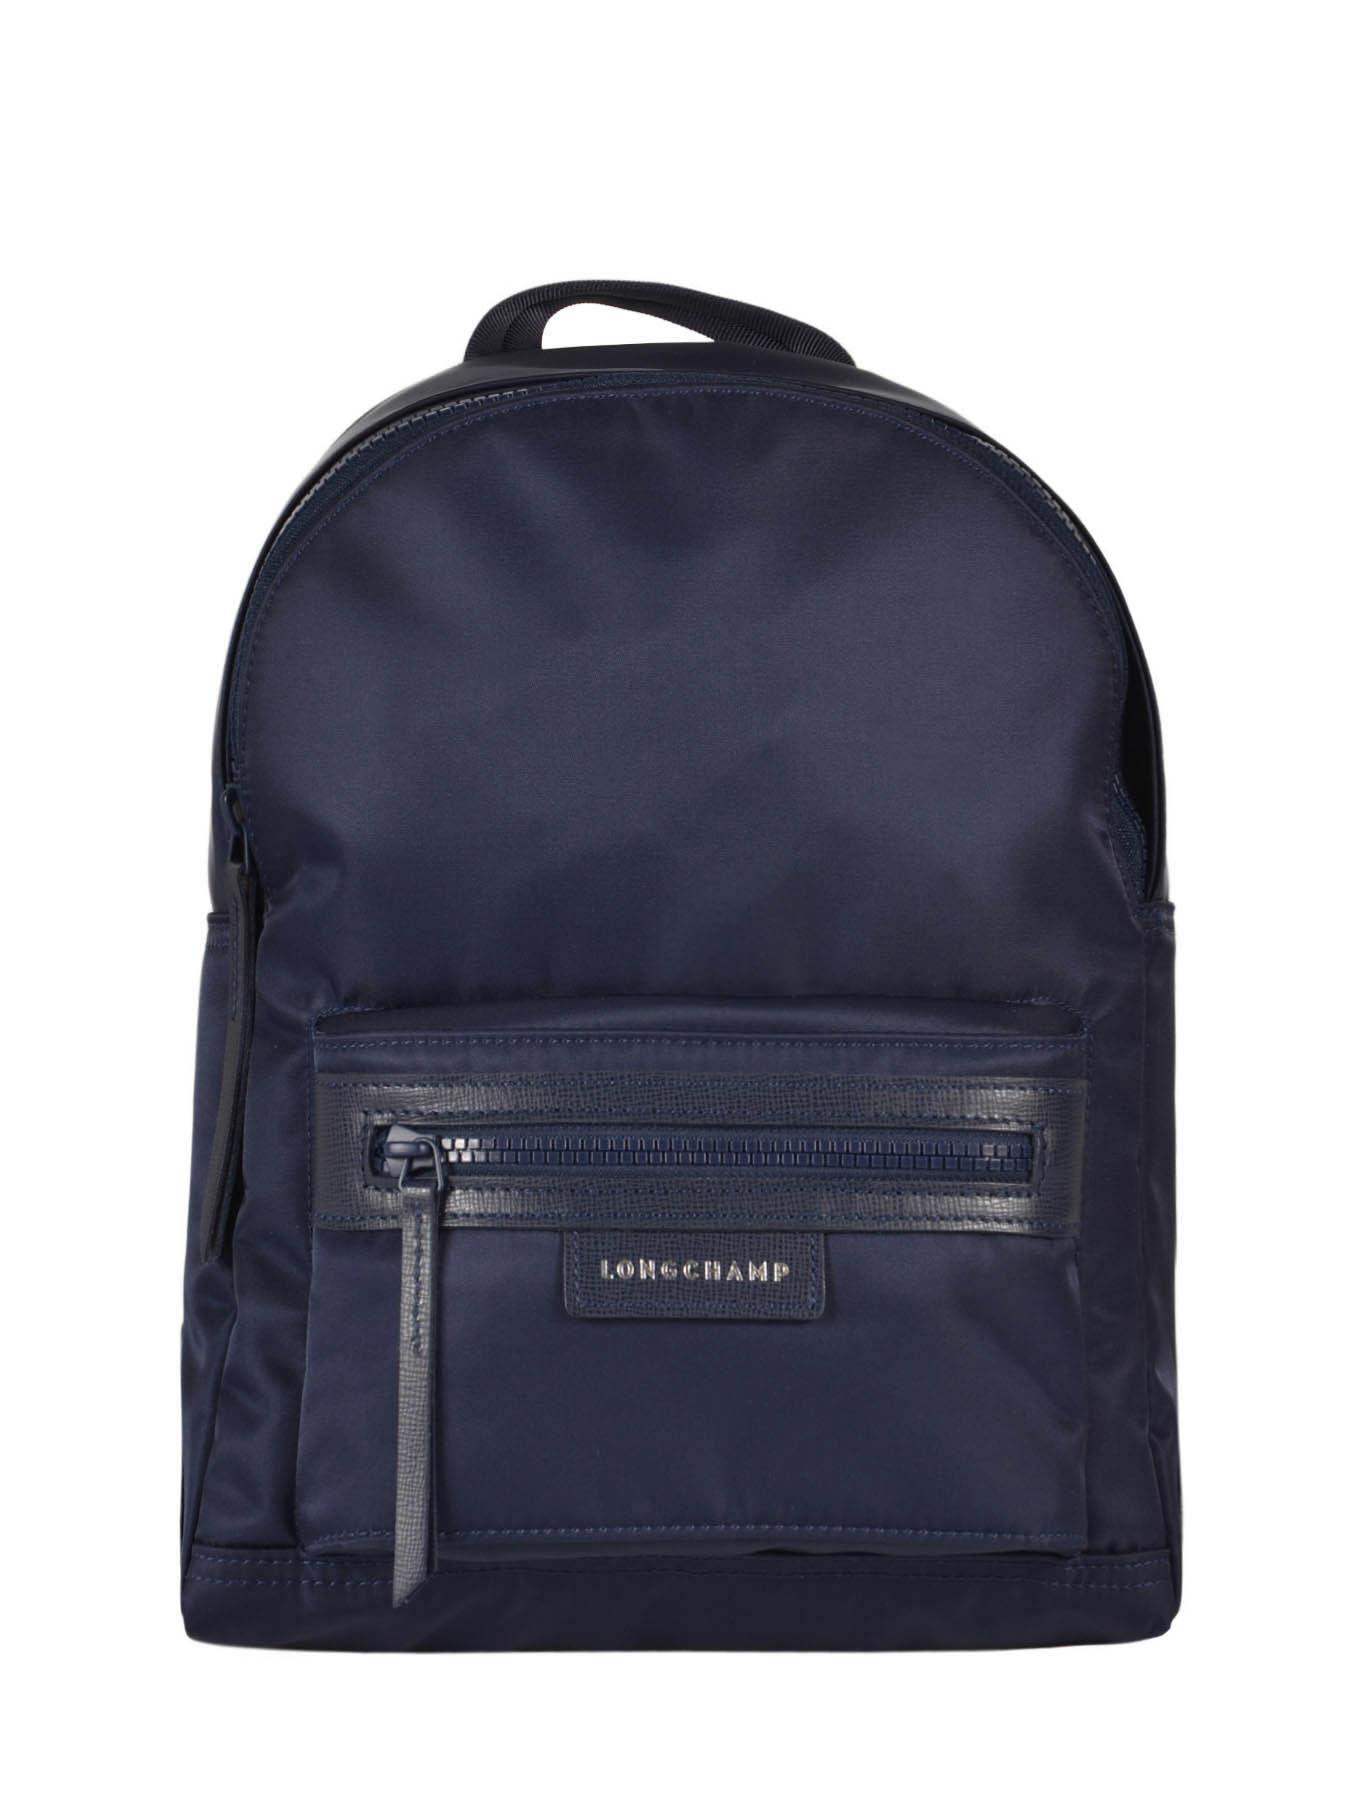 2b7388733b61 Longchamp Backpack Blue · Longchamp Backpack Blue ...